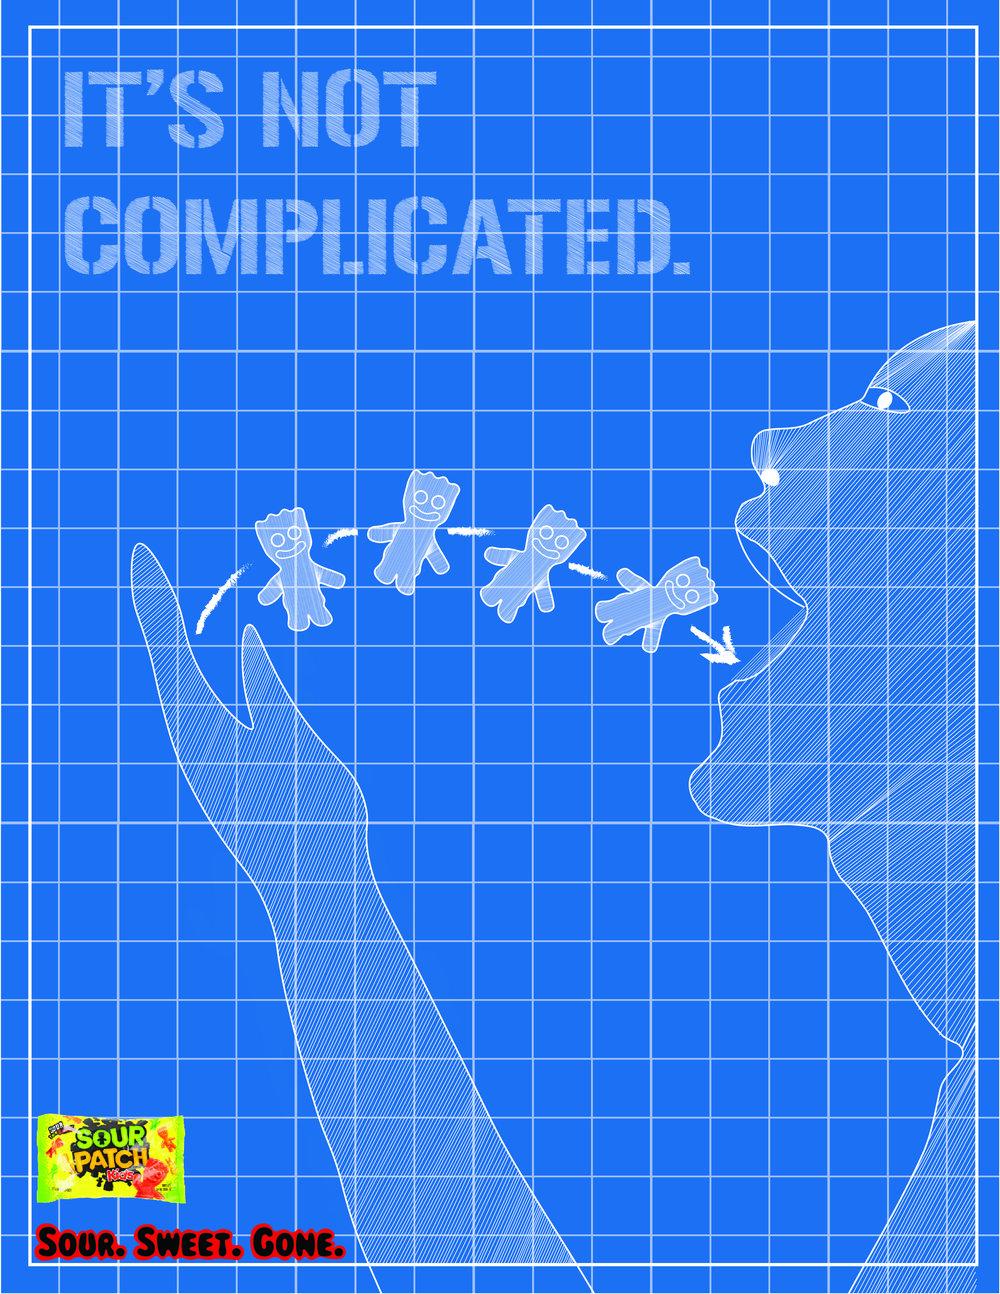 SPK ad 3 blueprint-01.jpg